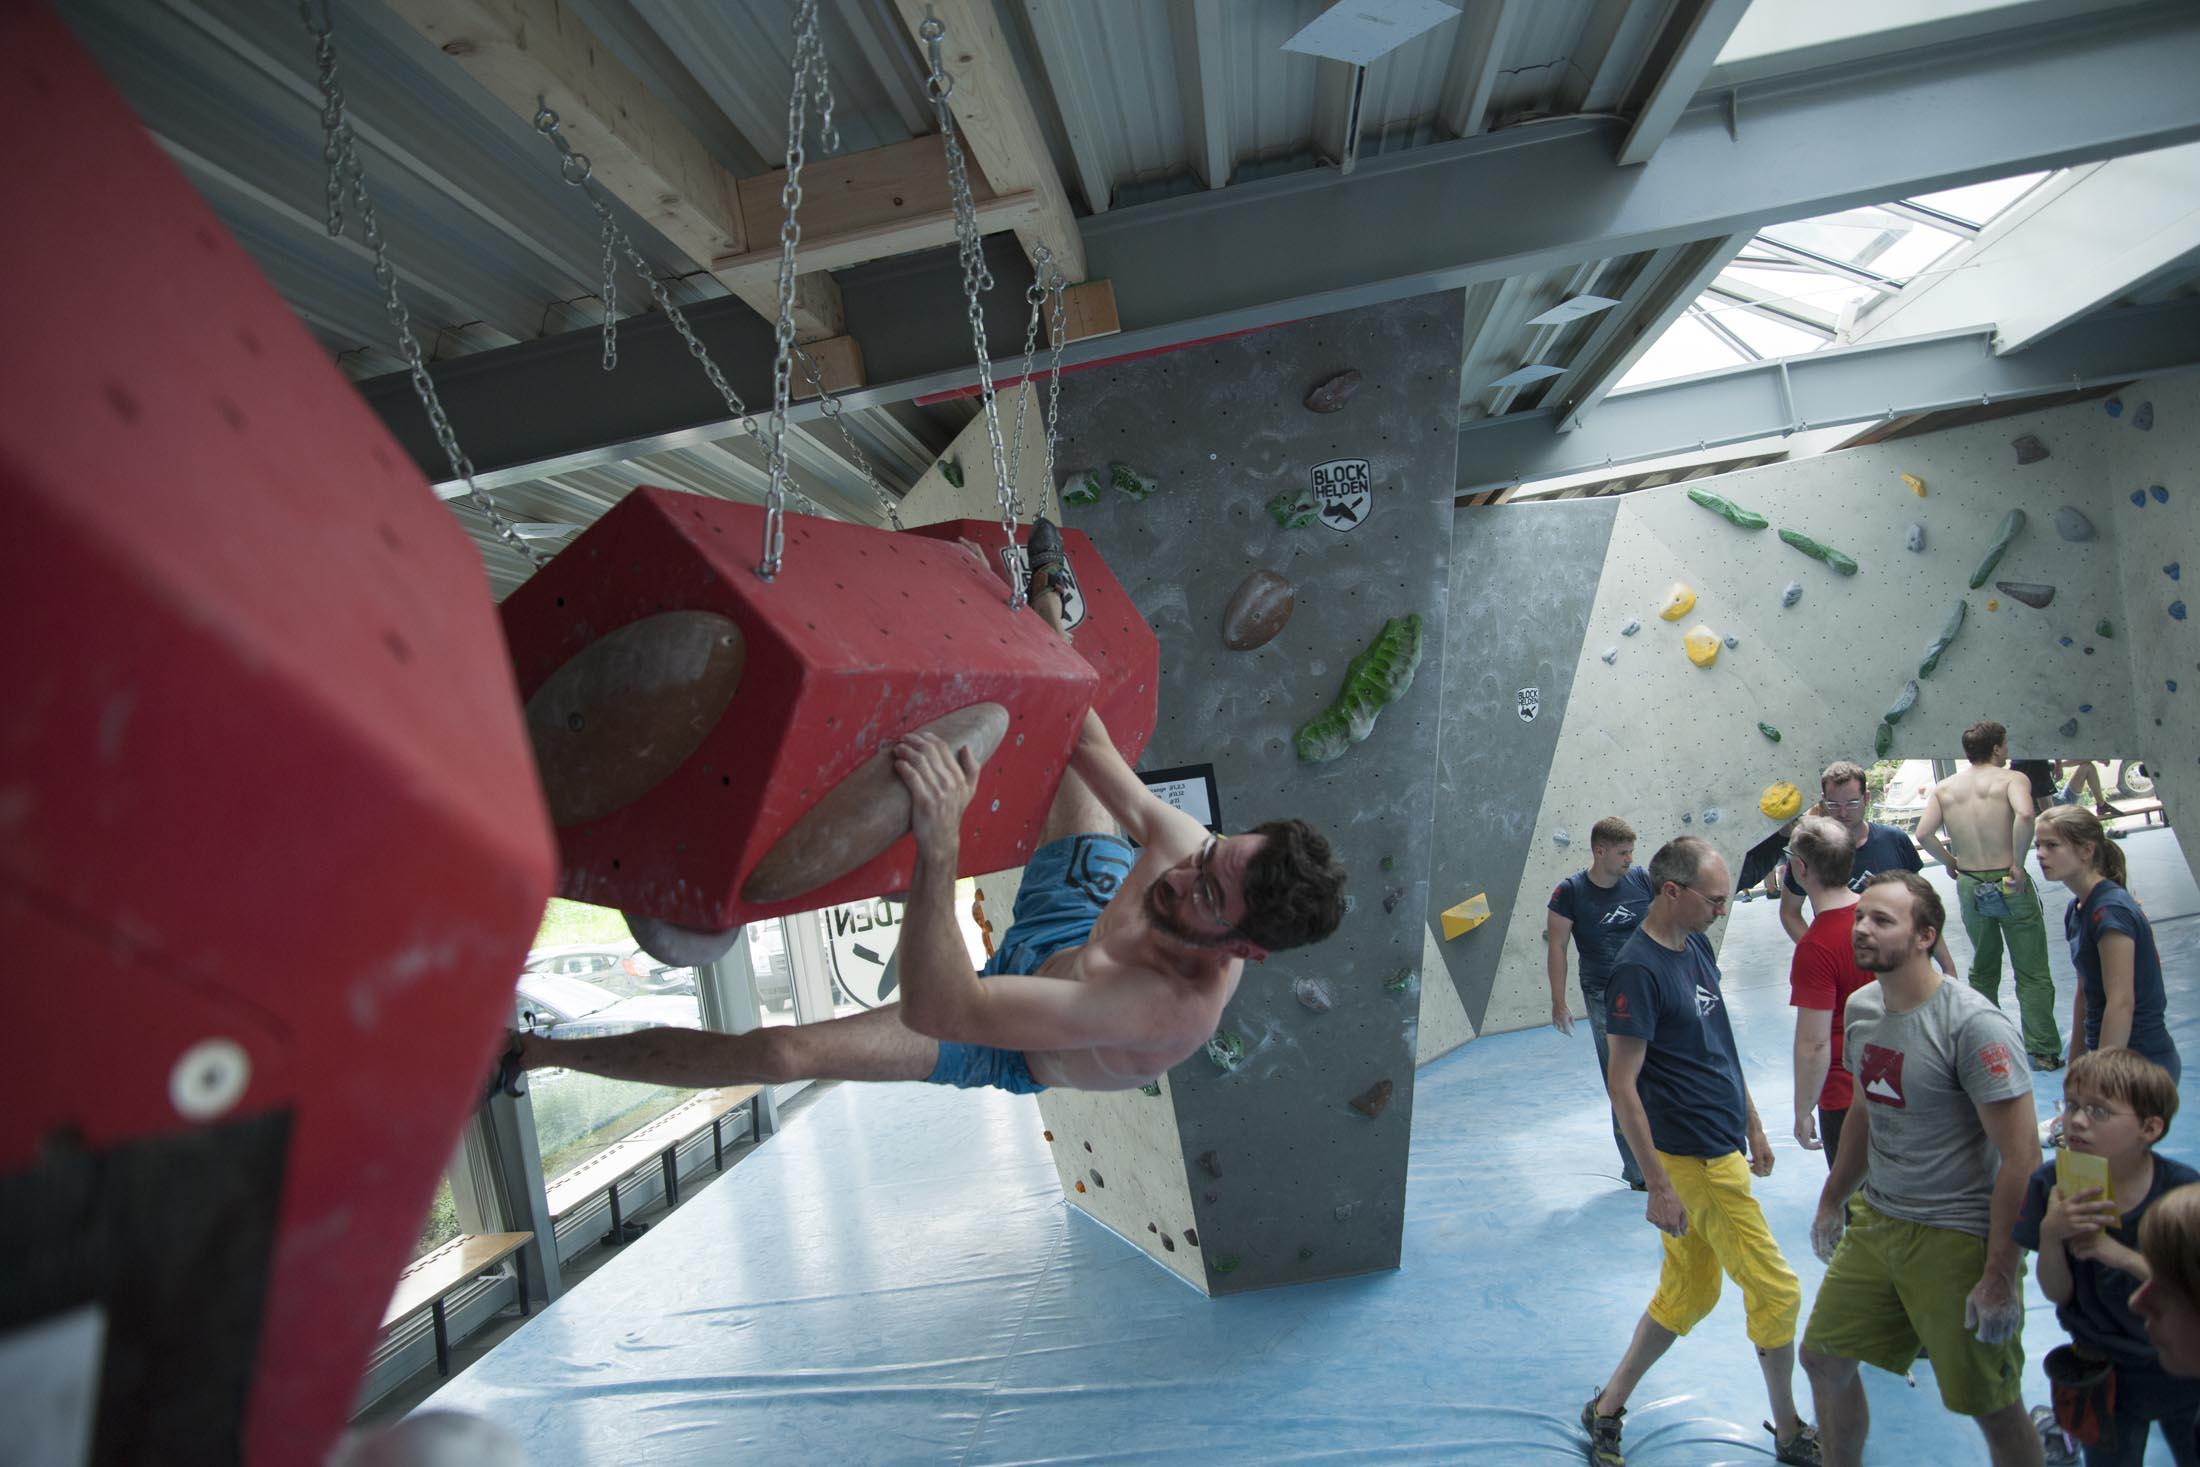 Quali, internationaler bouldercup Frankenjura 2016, BLOCKHELDEN Erlangen, Mammut, Bergfreunde.de, Boulderwettkampf07092016337